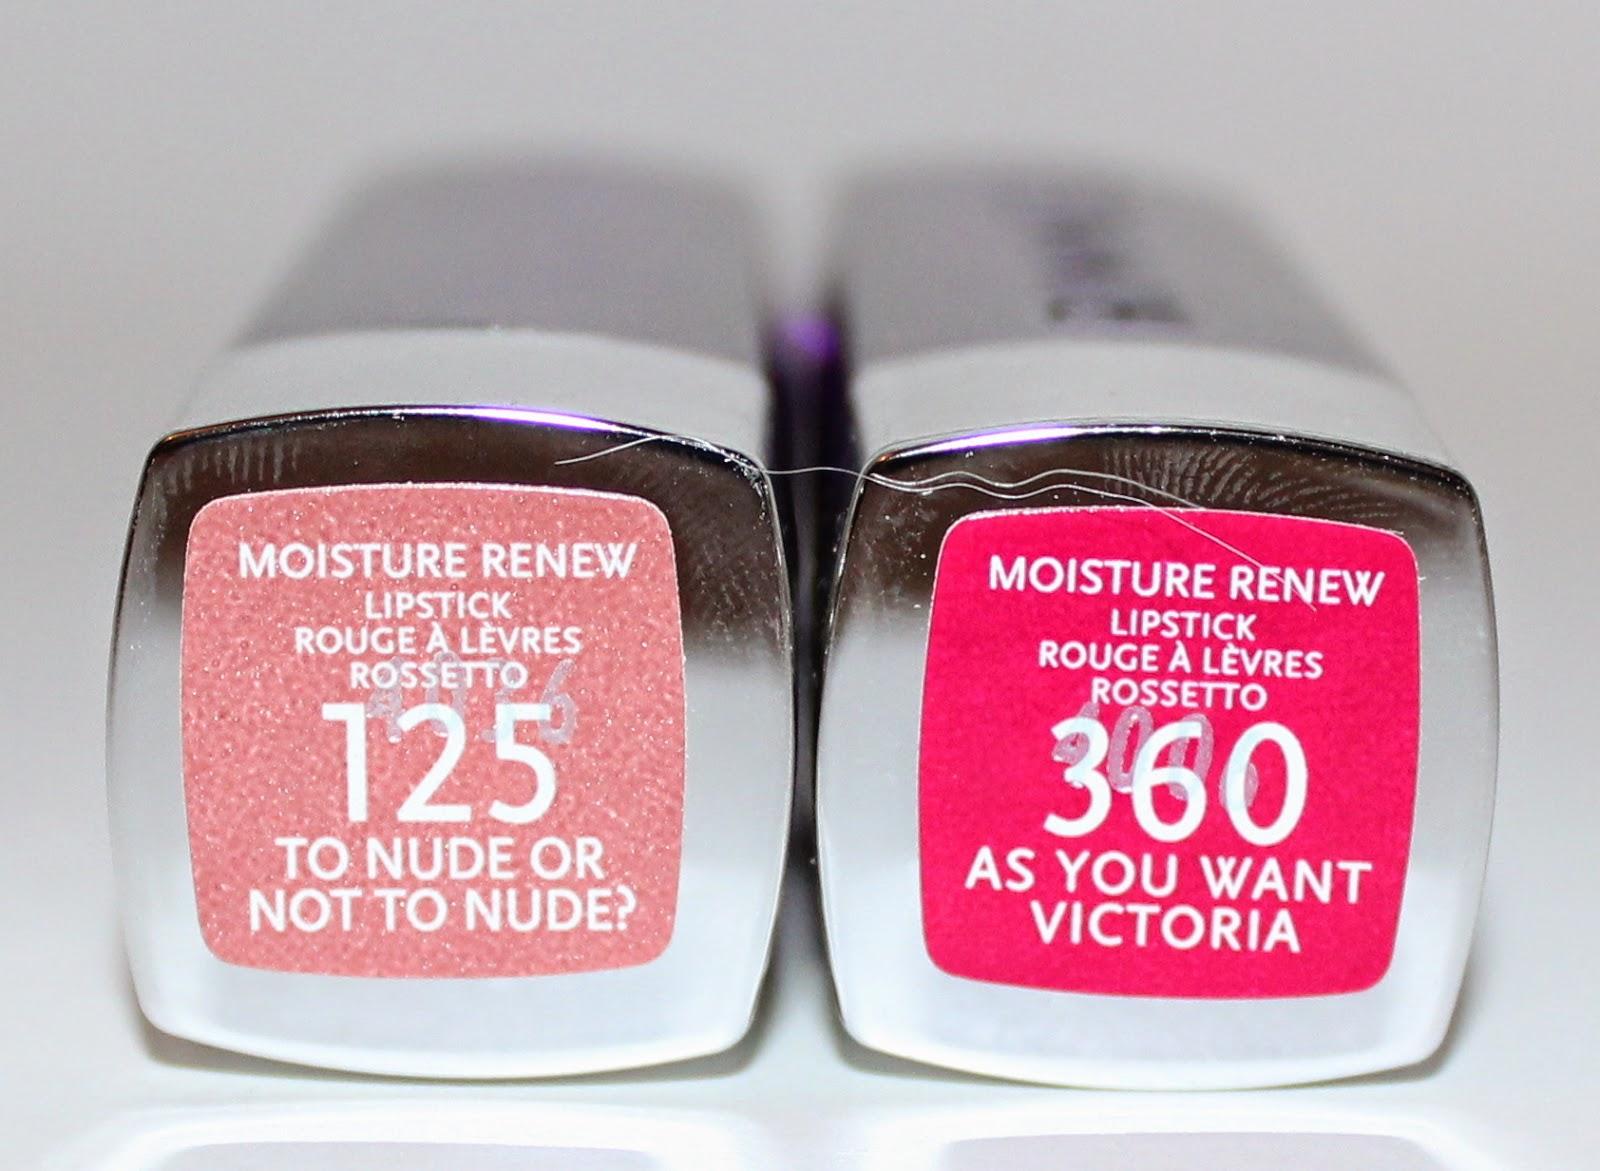 Rimmel Moisture Renew Lipstick Labels